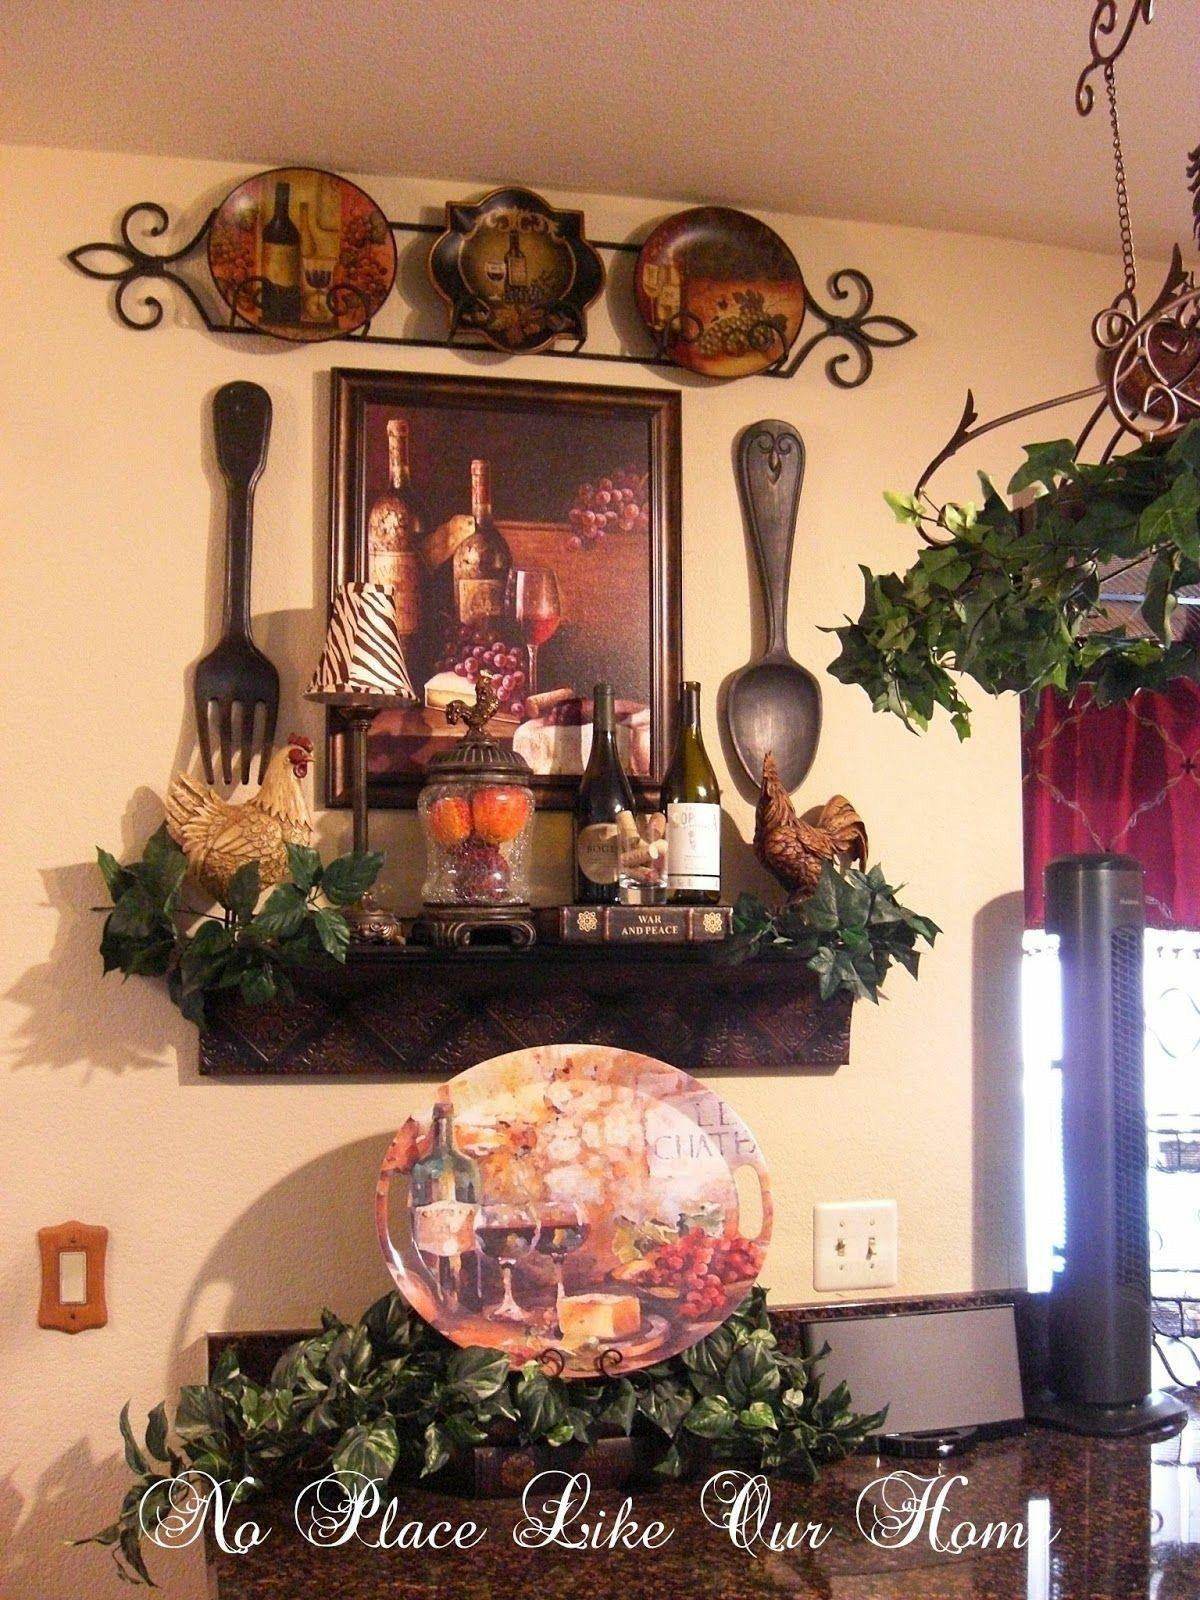 Pin By Raquel Sanchez On Futuro Hogar Wine Decor Kitchen Grape Kitchen Decor Kitchen Decor Themes